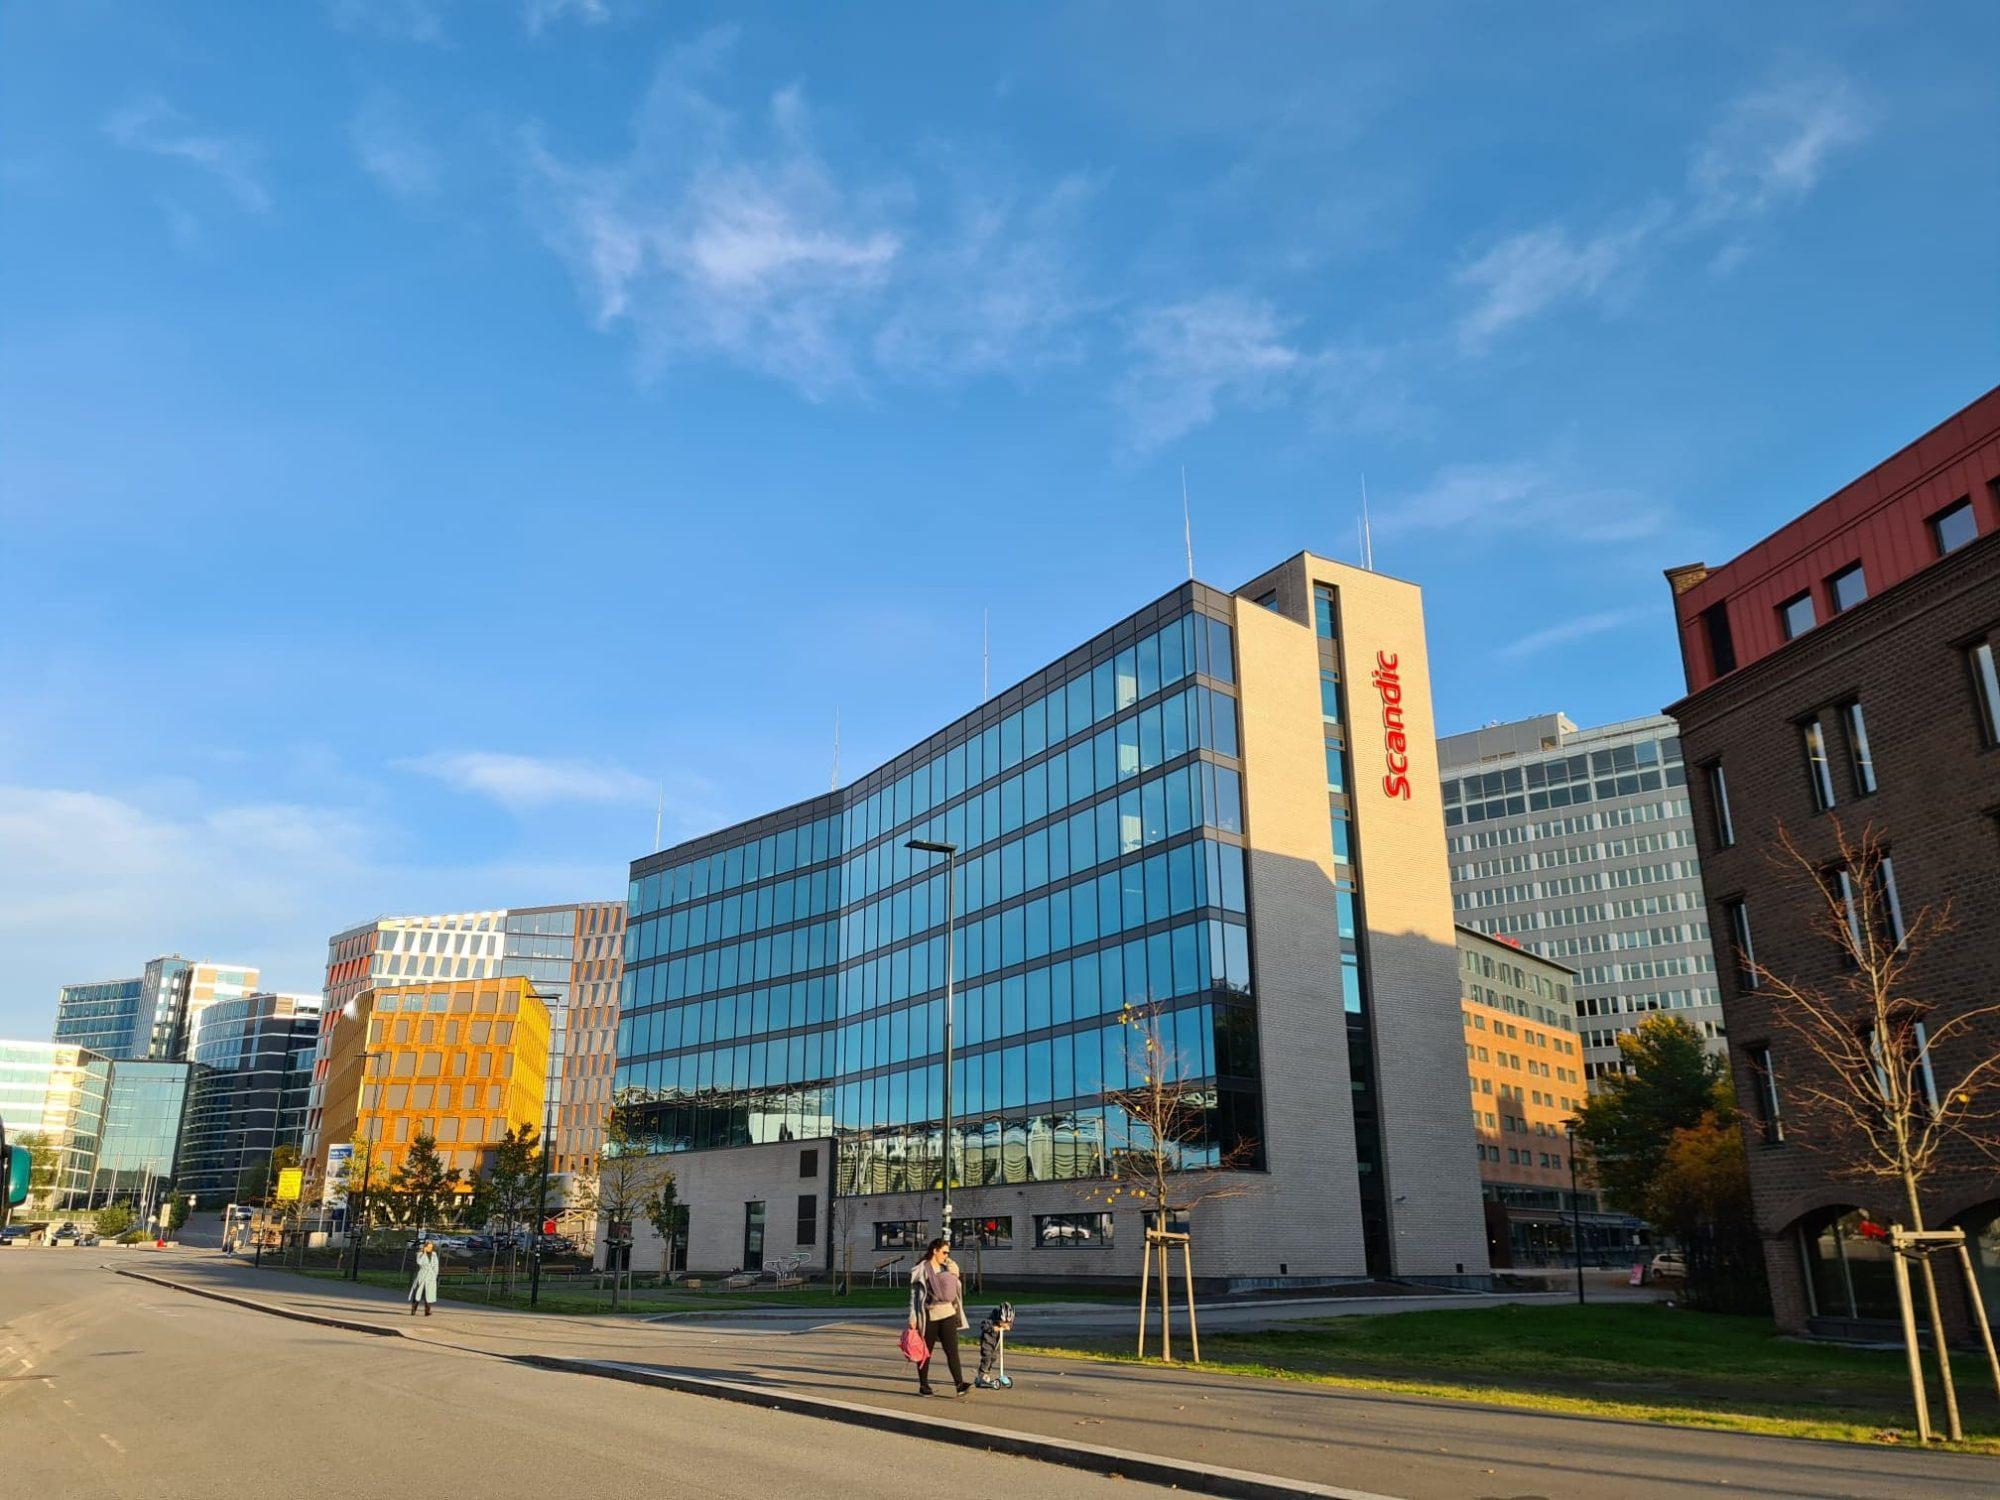 Scandic Helsfyr Ny fasade i miljø